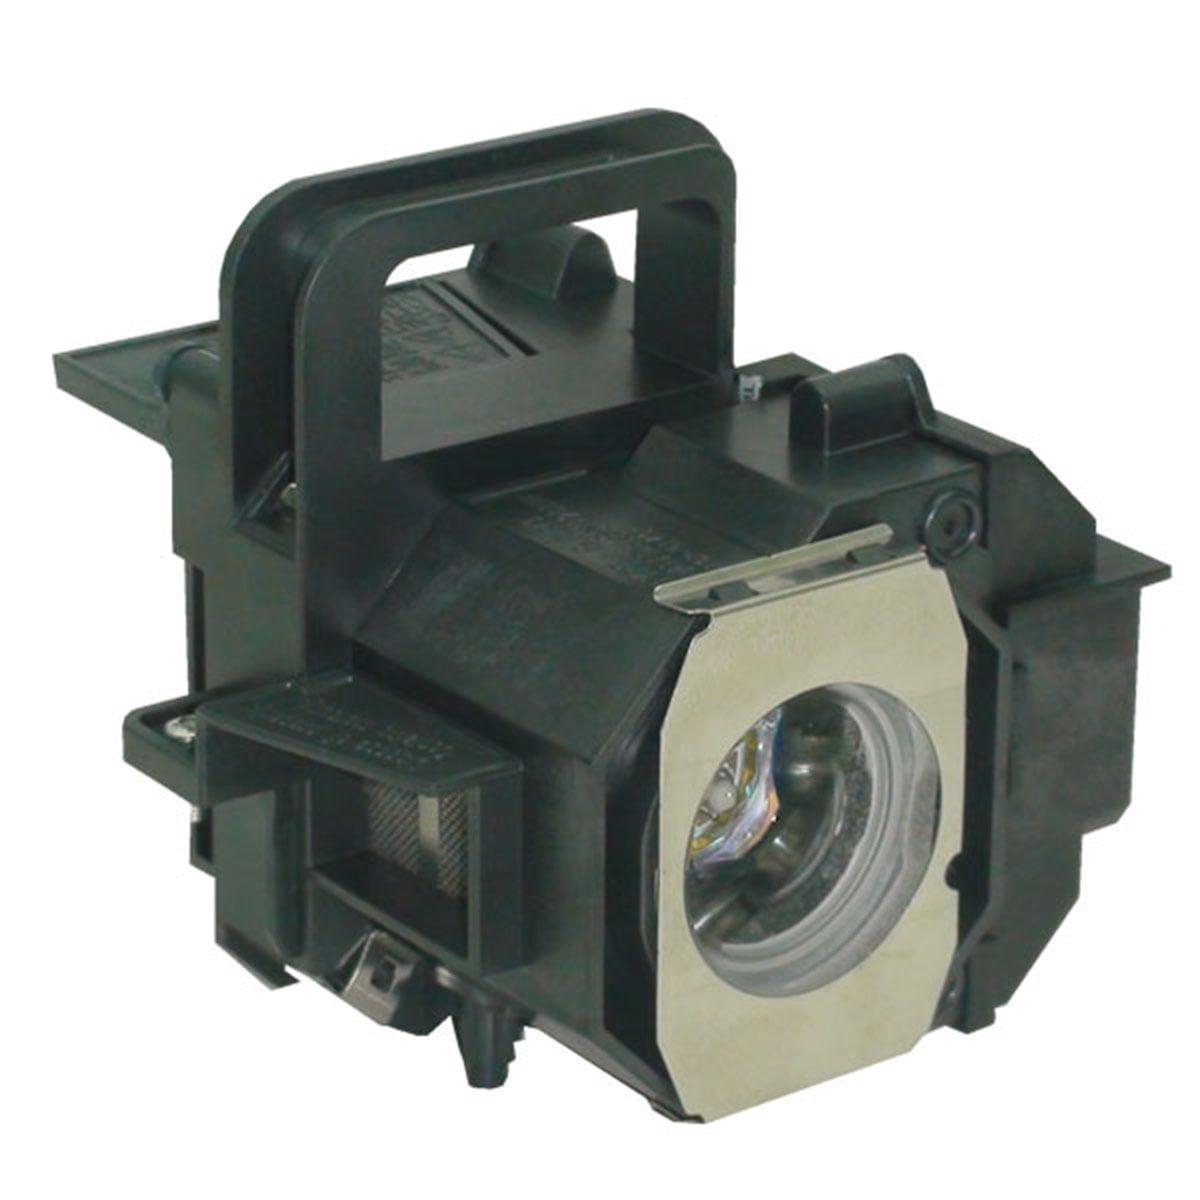 Lutema Platinum Bulb for Epson PowerLite Home Cinema 8700 UB Projector (Lamp Only) - image 1 de 5